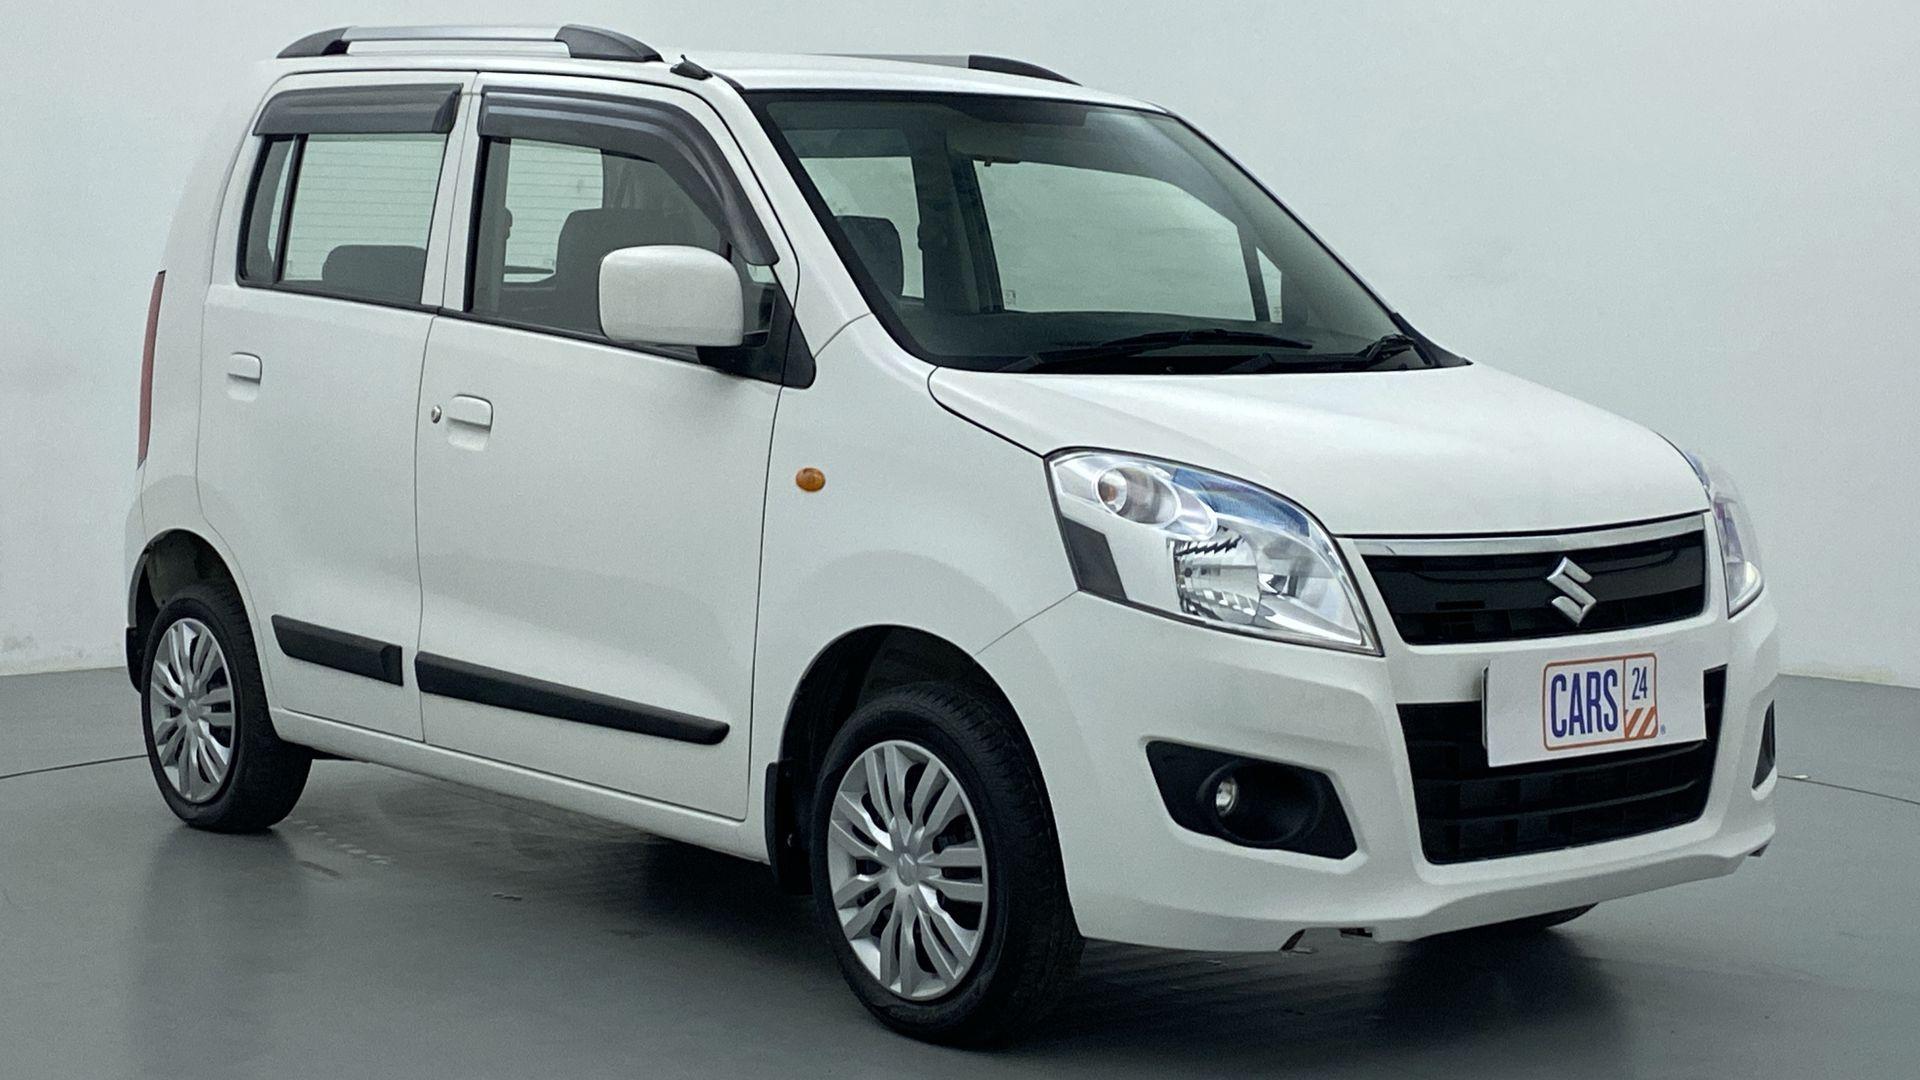 2016 Maruti Wagon R 1.0 VXI